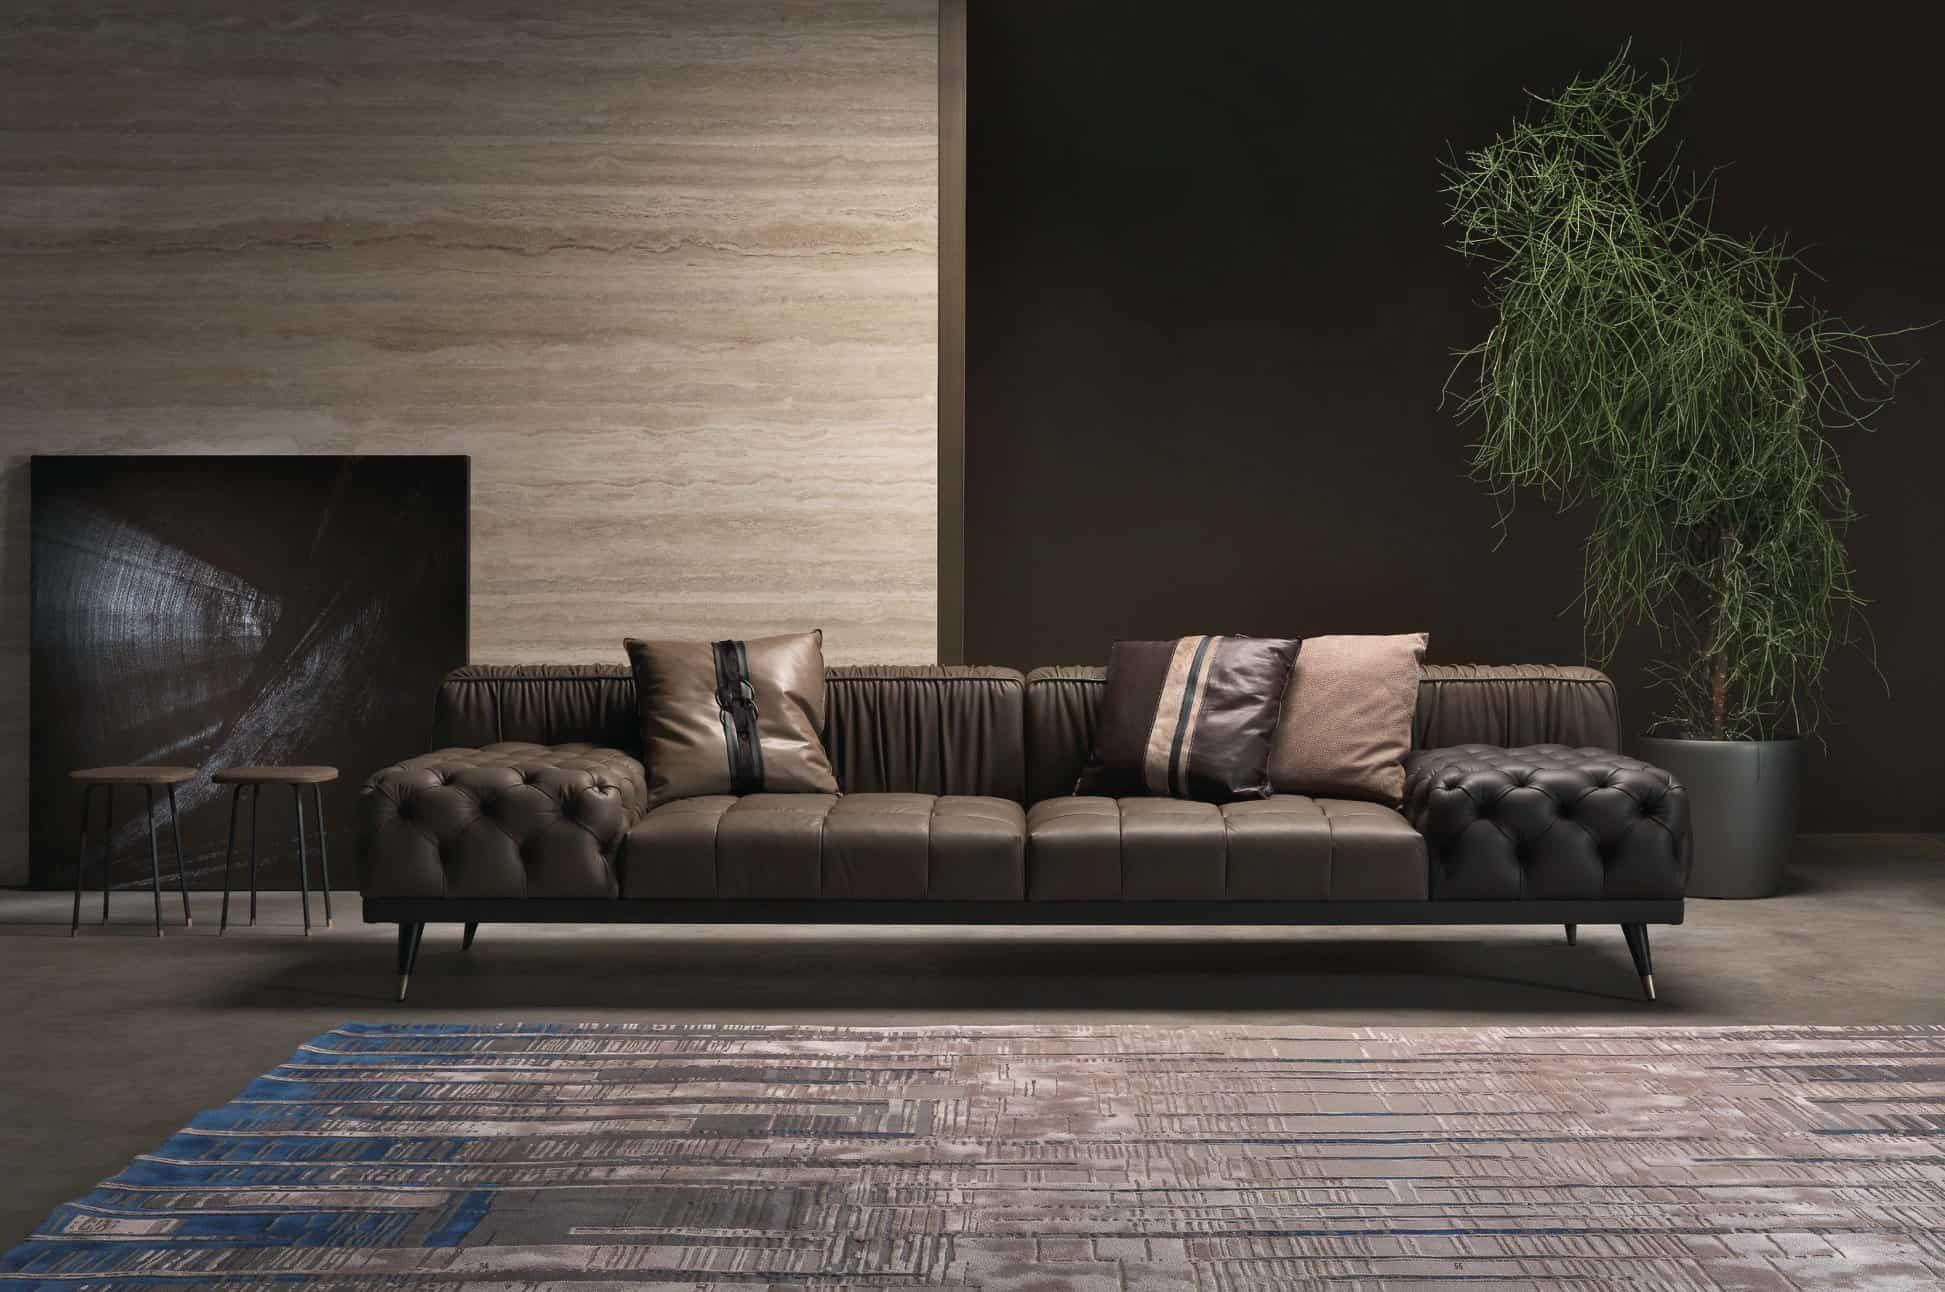 Gianfranco Ferre Home Colorsworld Chocolate Dark Hazelnut Turtledove A Super Chic Mix Of Nuance Contemporary Designers Furniture Mobilya Tekli Koltuk Koltuklar